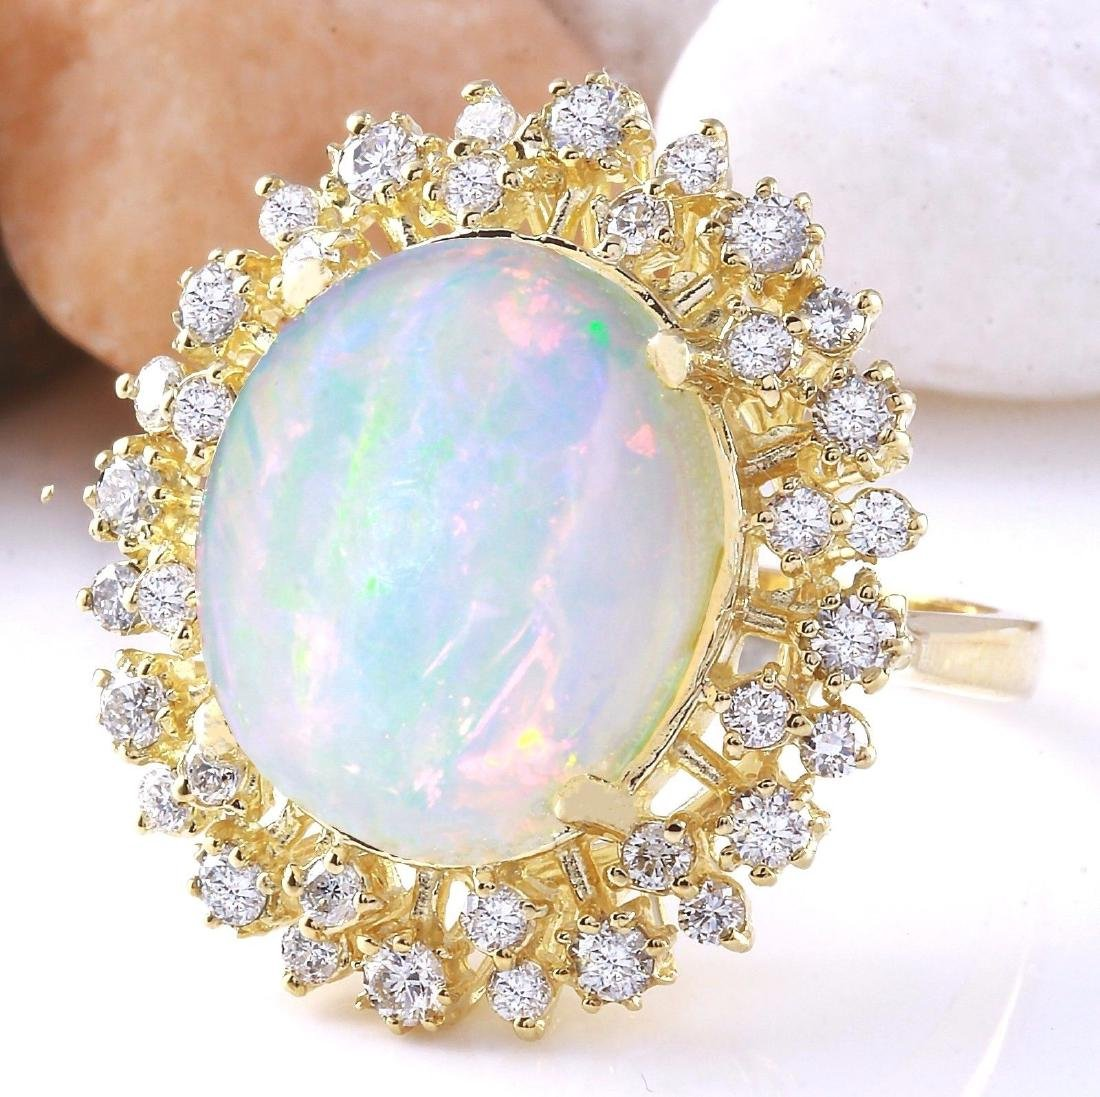 8.75 Carat Natural Opal 18K Solid Yellow Gold Diamond - 2